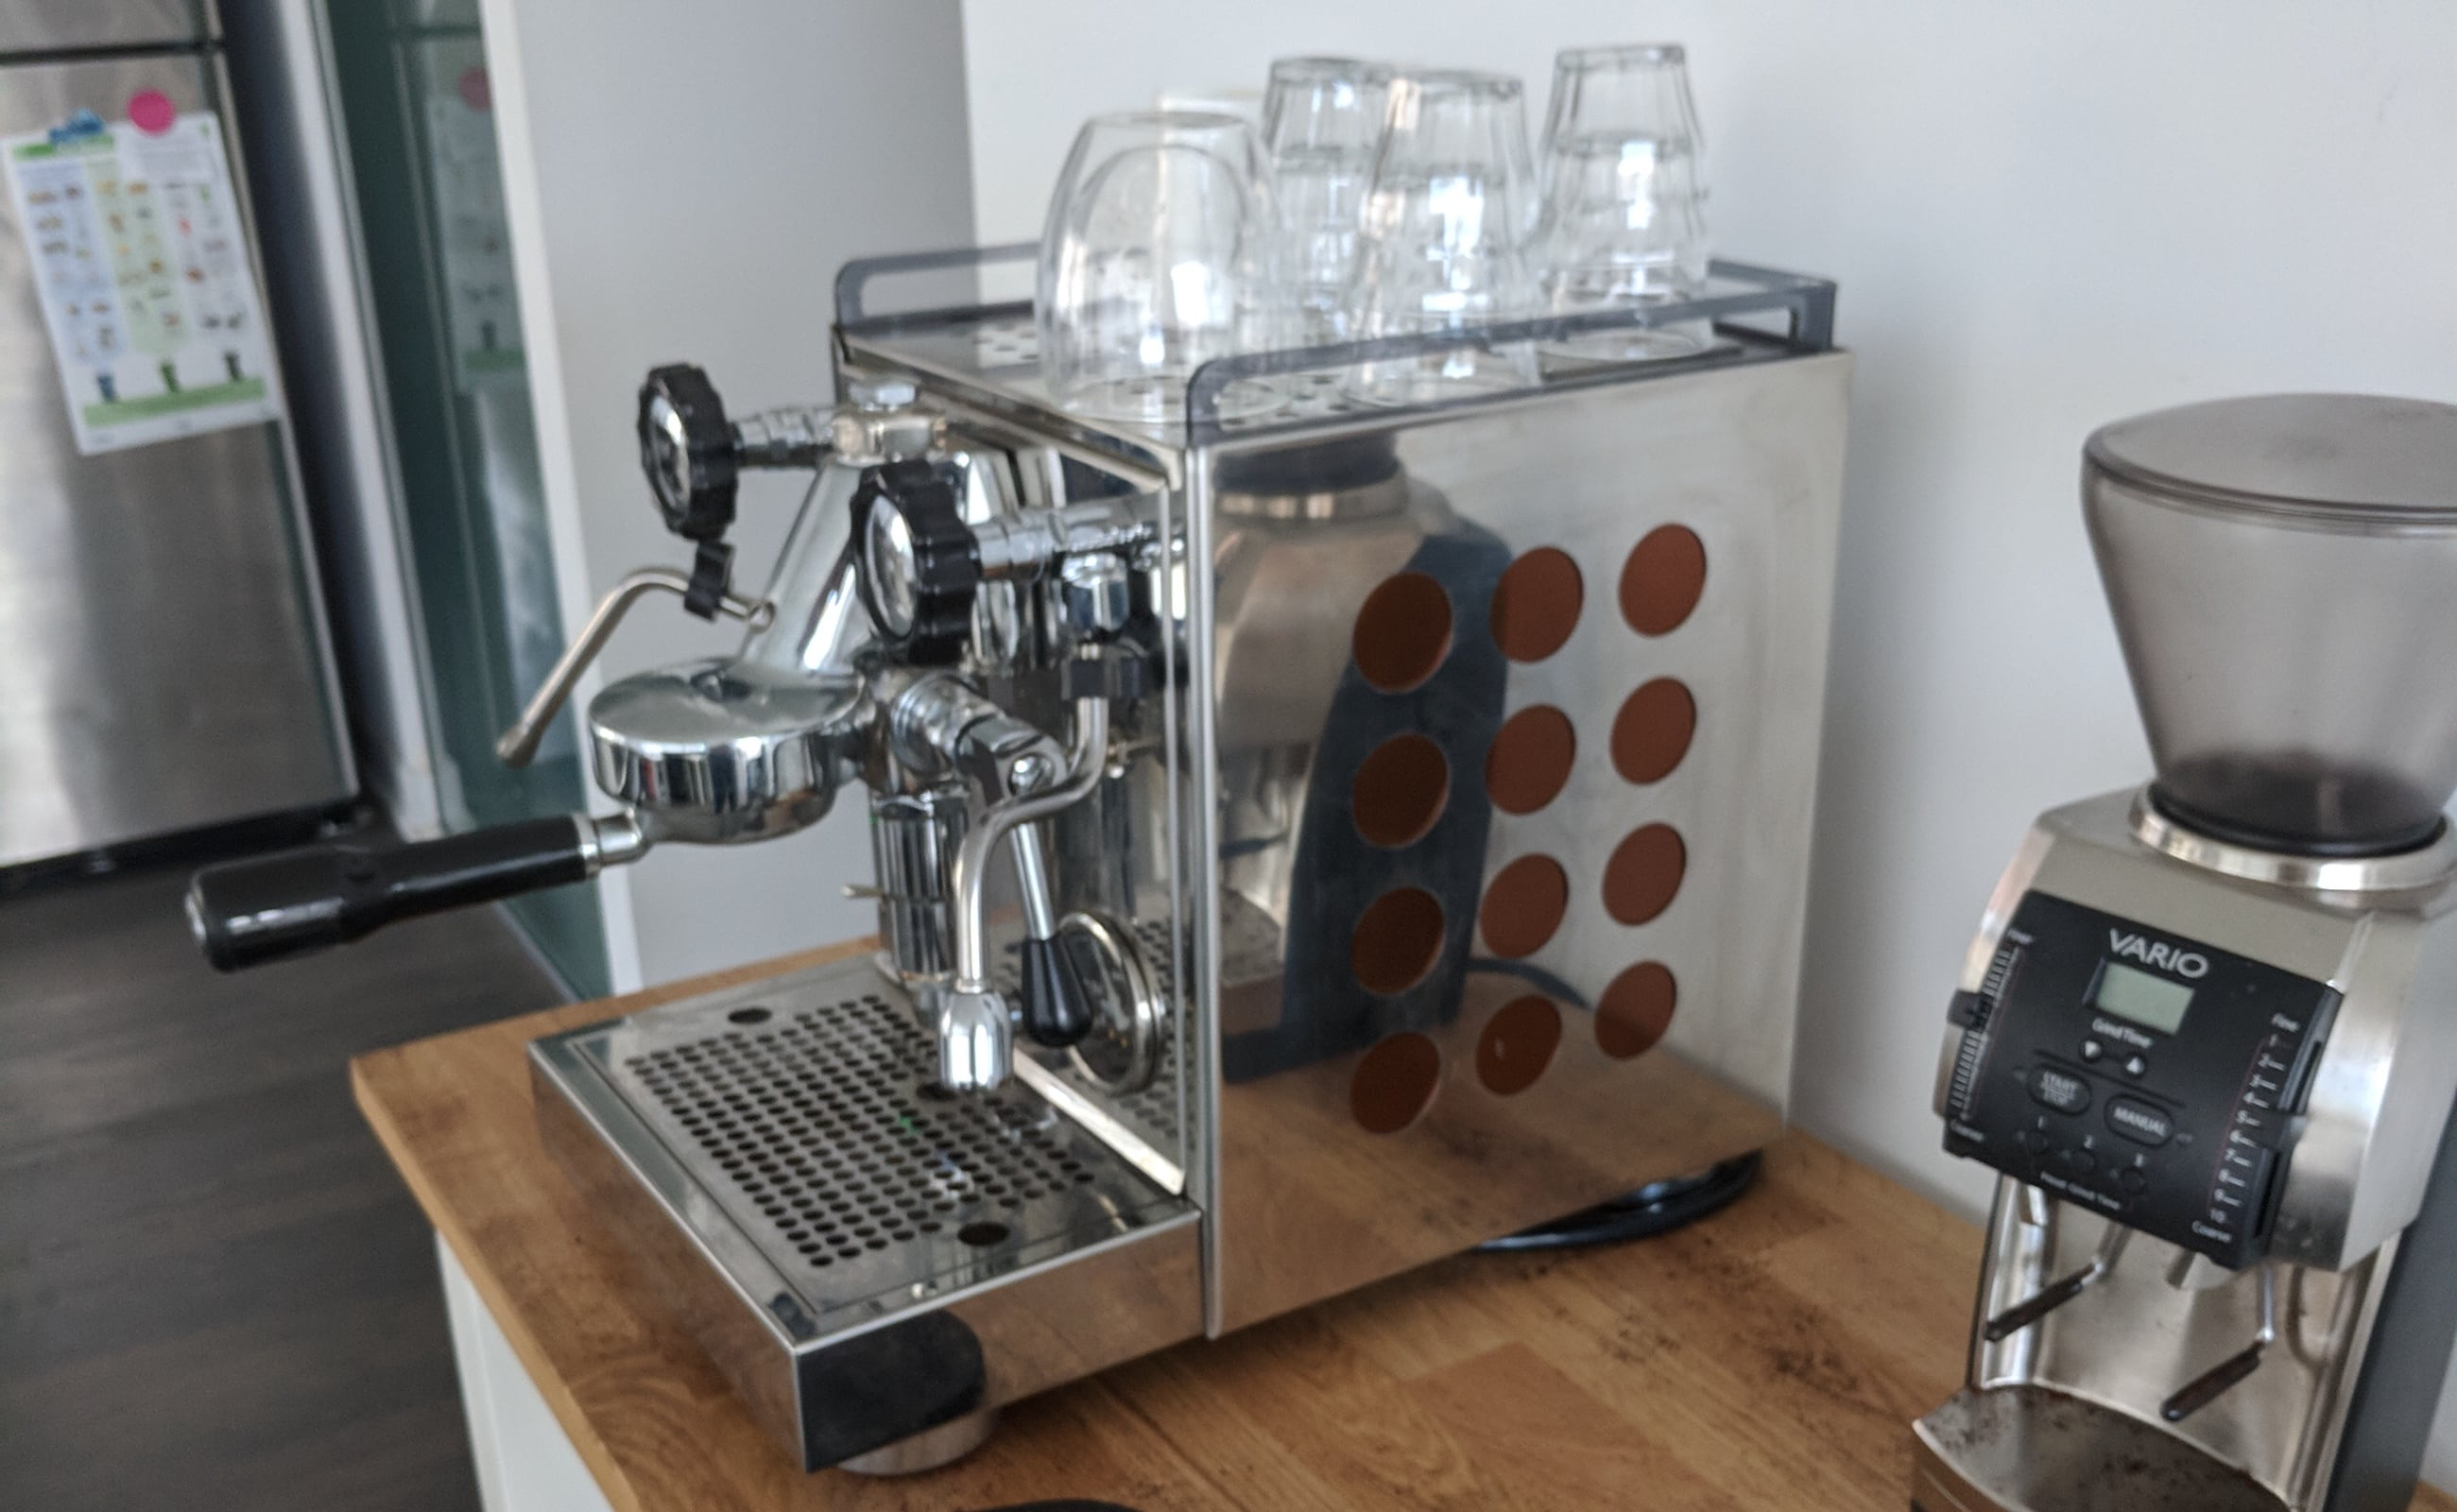 Rocket Espresso Appartamento Compact Espresso Machine brings the coffee shop to you